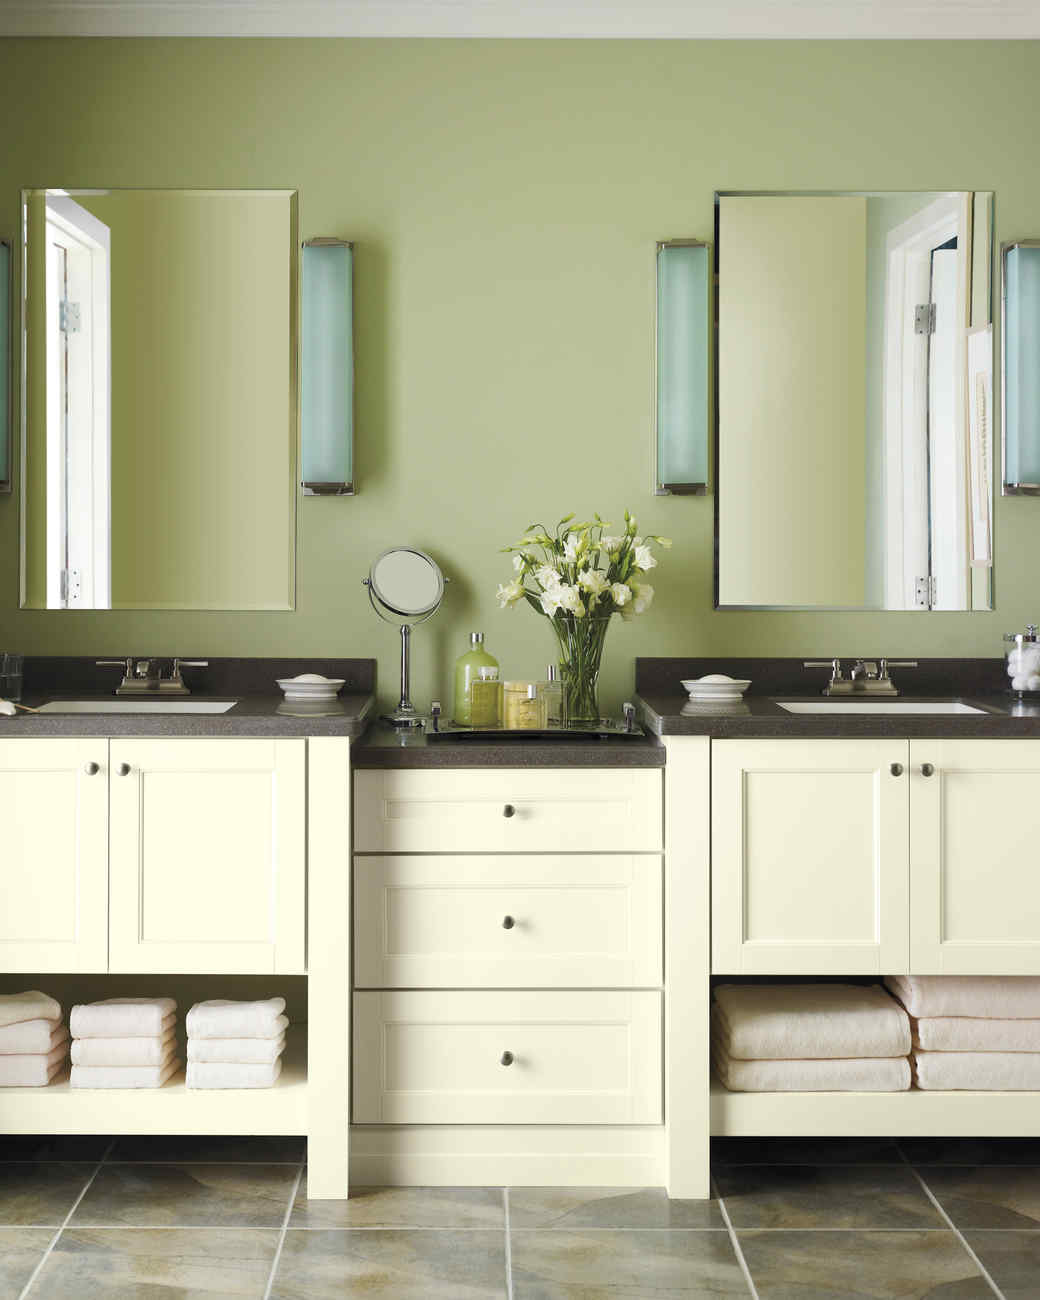 Charming Rent A Bathroom Perth Tall Small Corner Mirror Bathroom Cabinet Rectangular Bathroom Drawer Base Cabinets Lowes Bathtub Drain Stopper Youthful Showerbathdesign WhiteInstall Drain Assembly Bathroom Sink 25 Bathroom Organizers | Martha Stewart